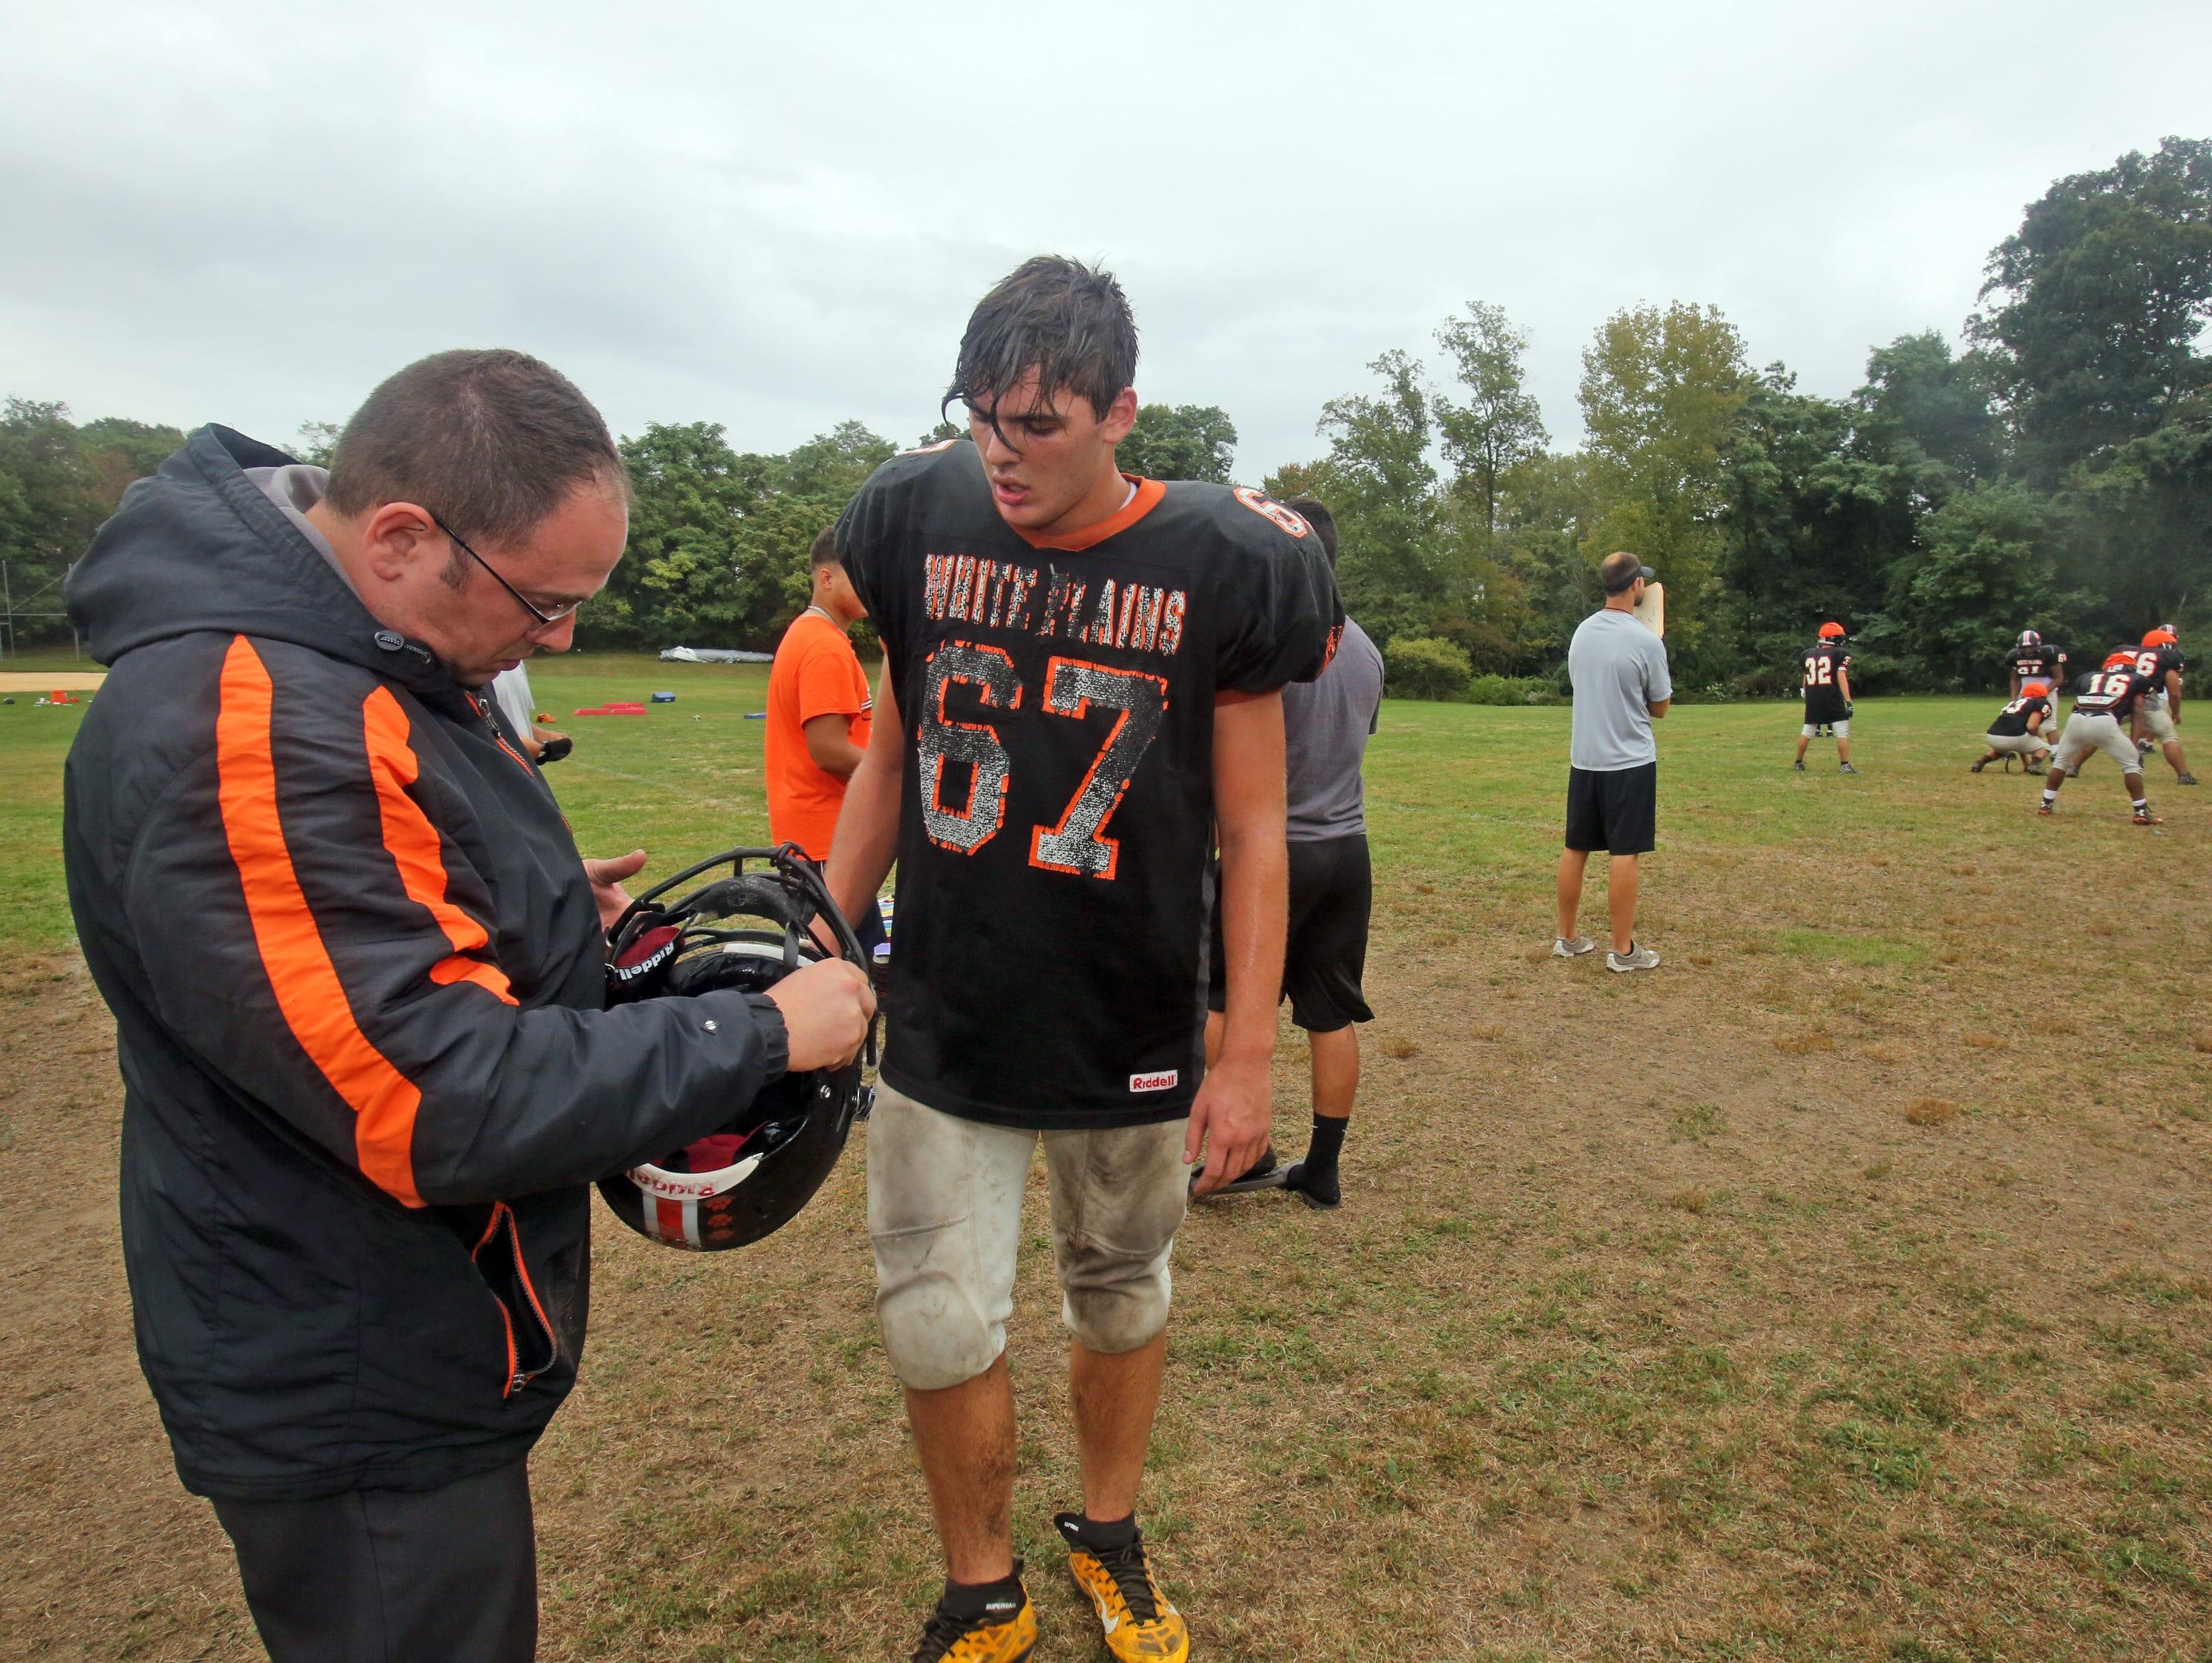 Mike Mirabella, the athletic trainer at White Plains High School, repairs Ernik Docaj's helmet during varsity football practice Sept. 29, 2015.